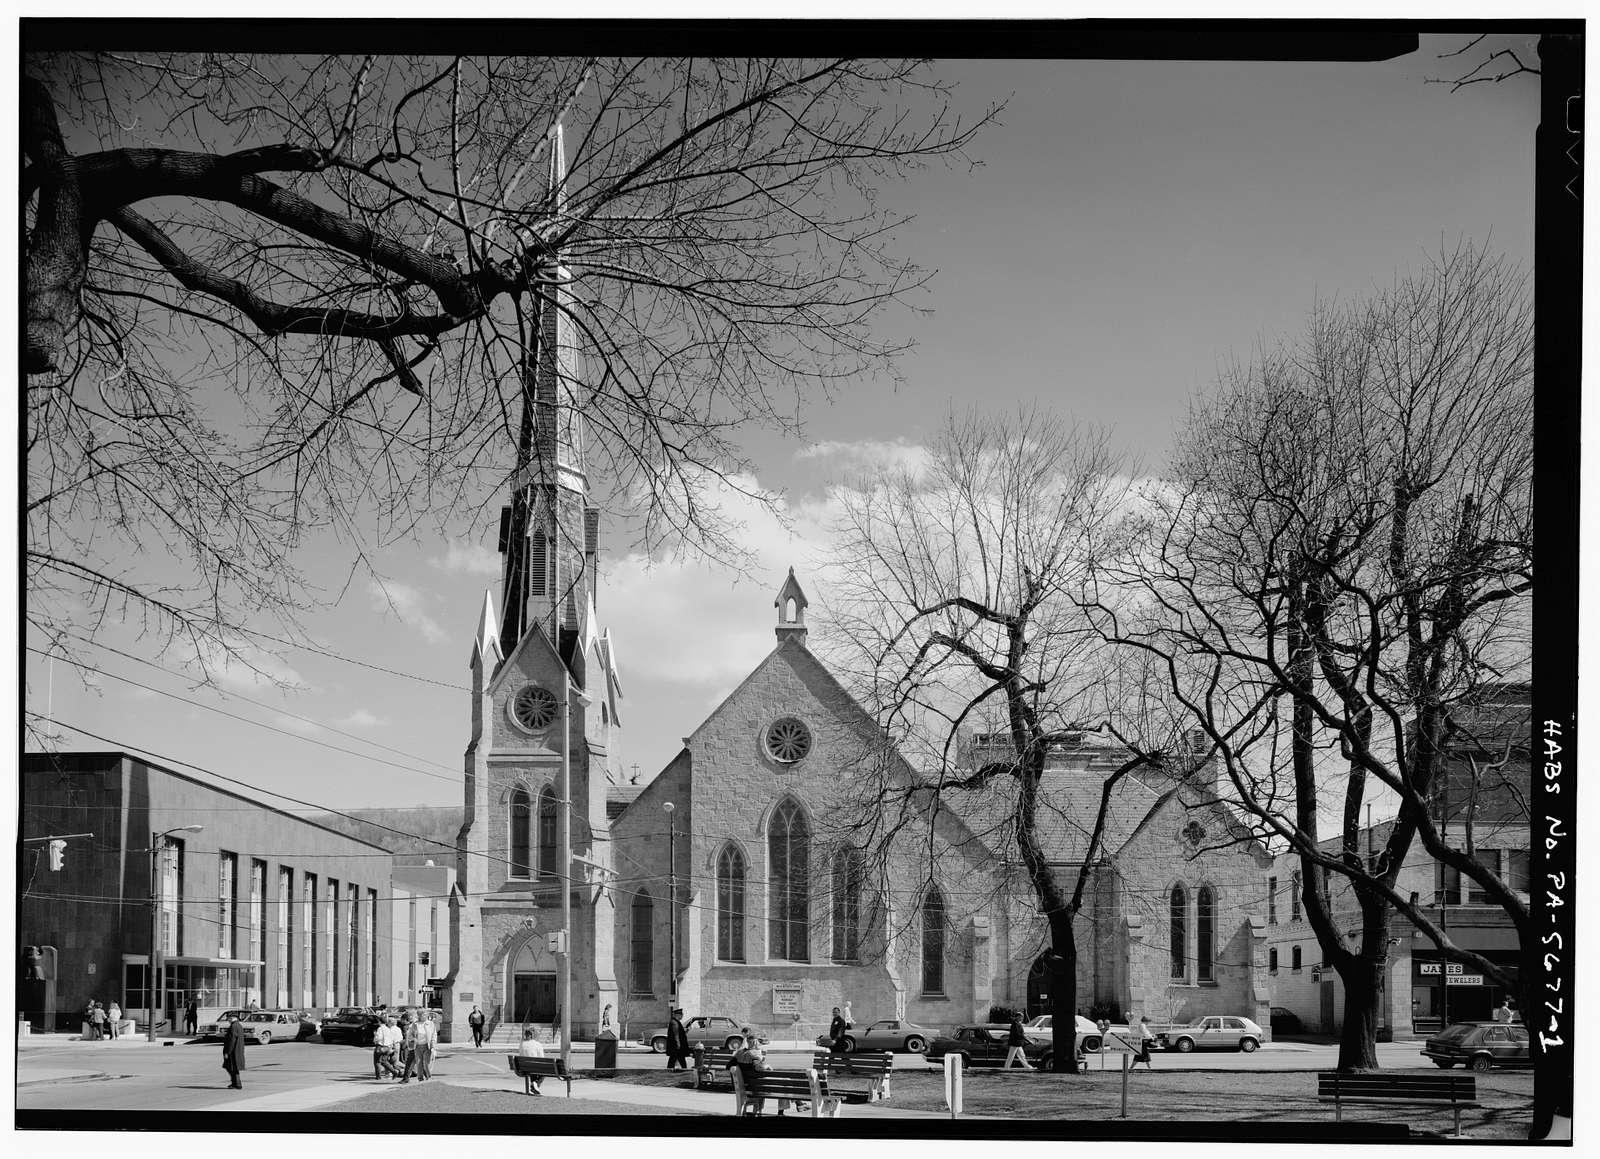 Franklin Street Methodist Church, 131 Franklin Street, Johnstown, Cambria County, PA